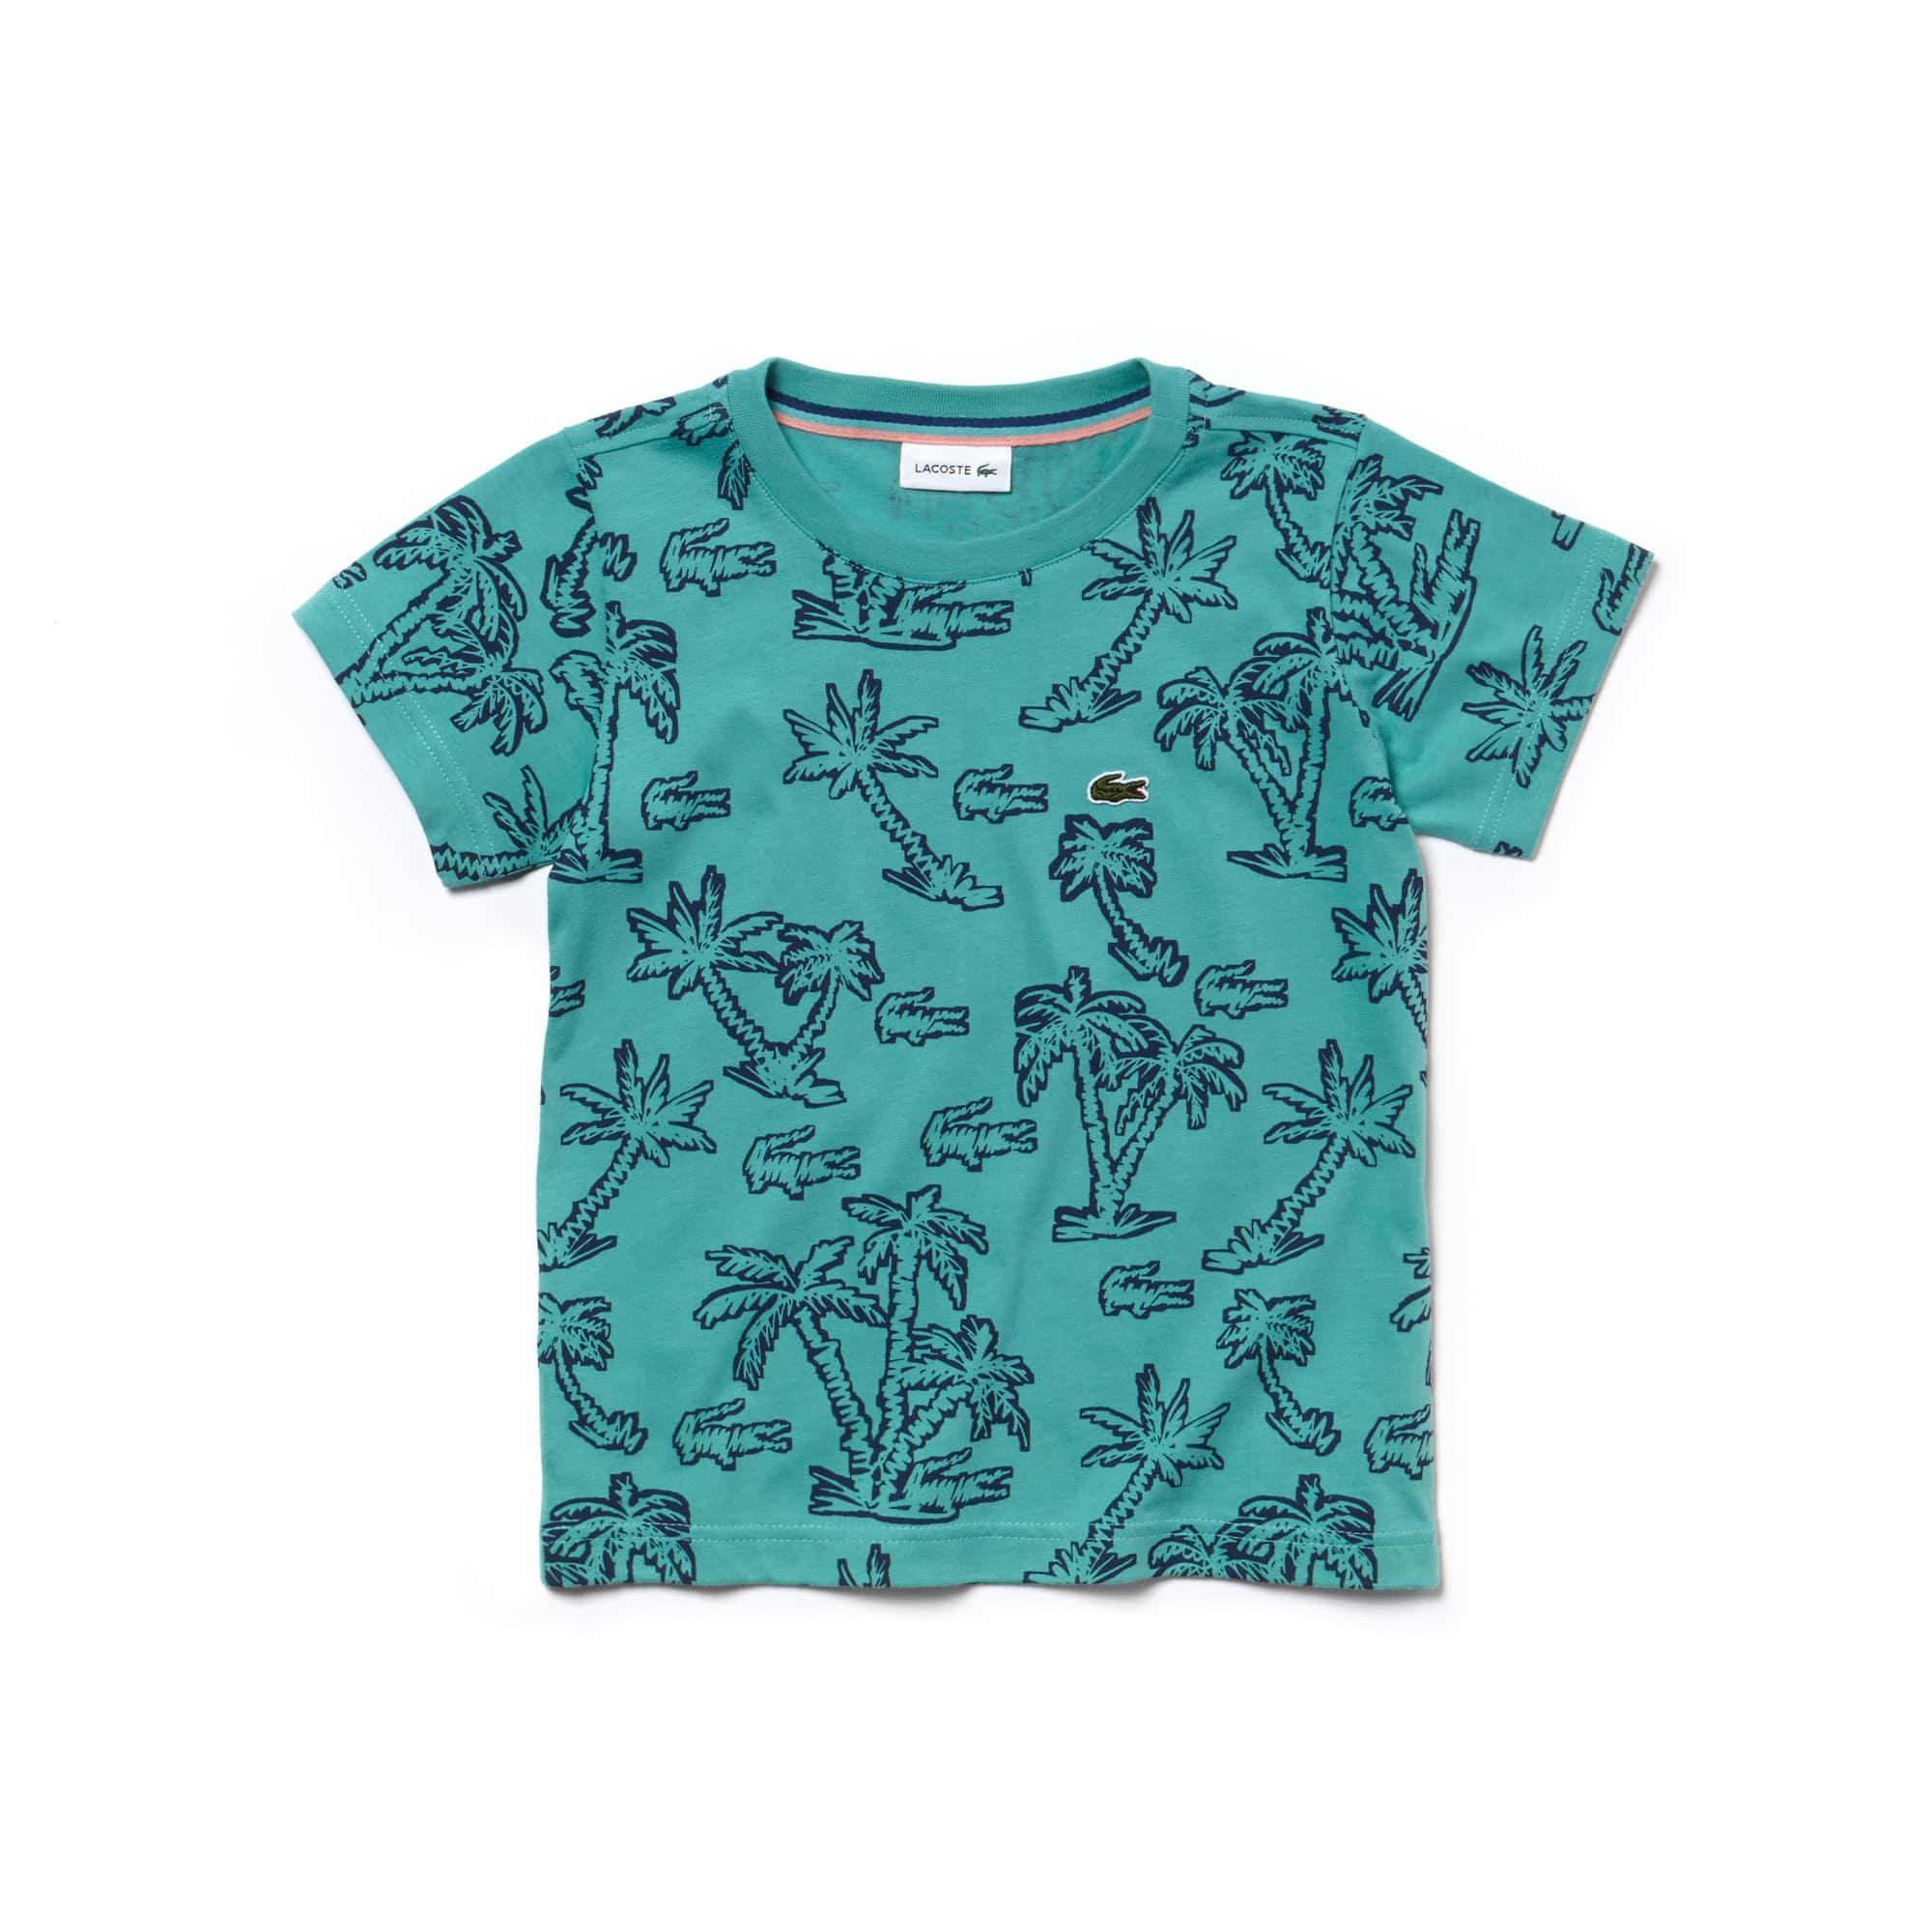 Boys' Crew Neck Palm Print Cotton Jersey T-shirt